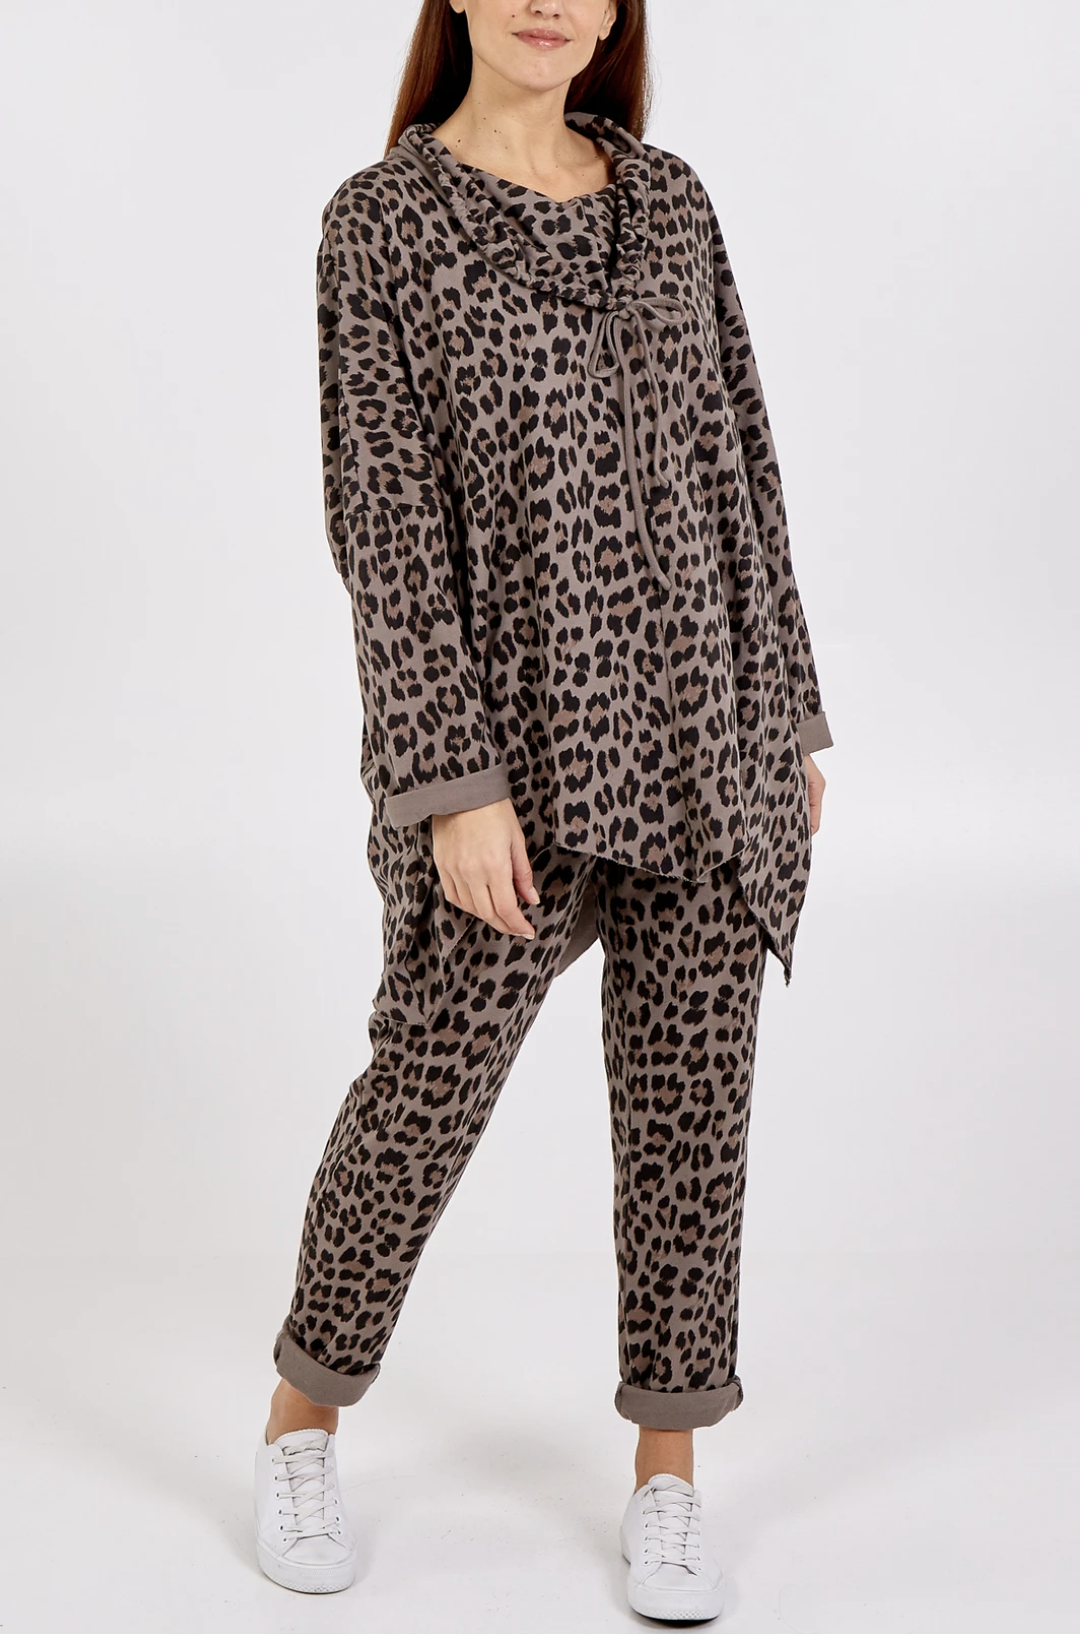 NV827 Leopard Print Jogger Set